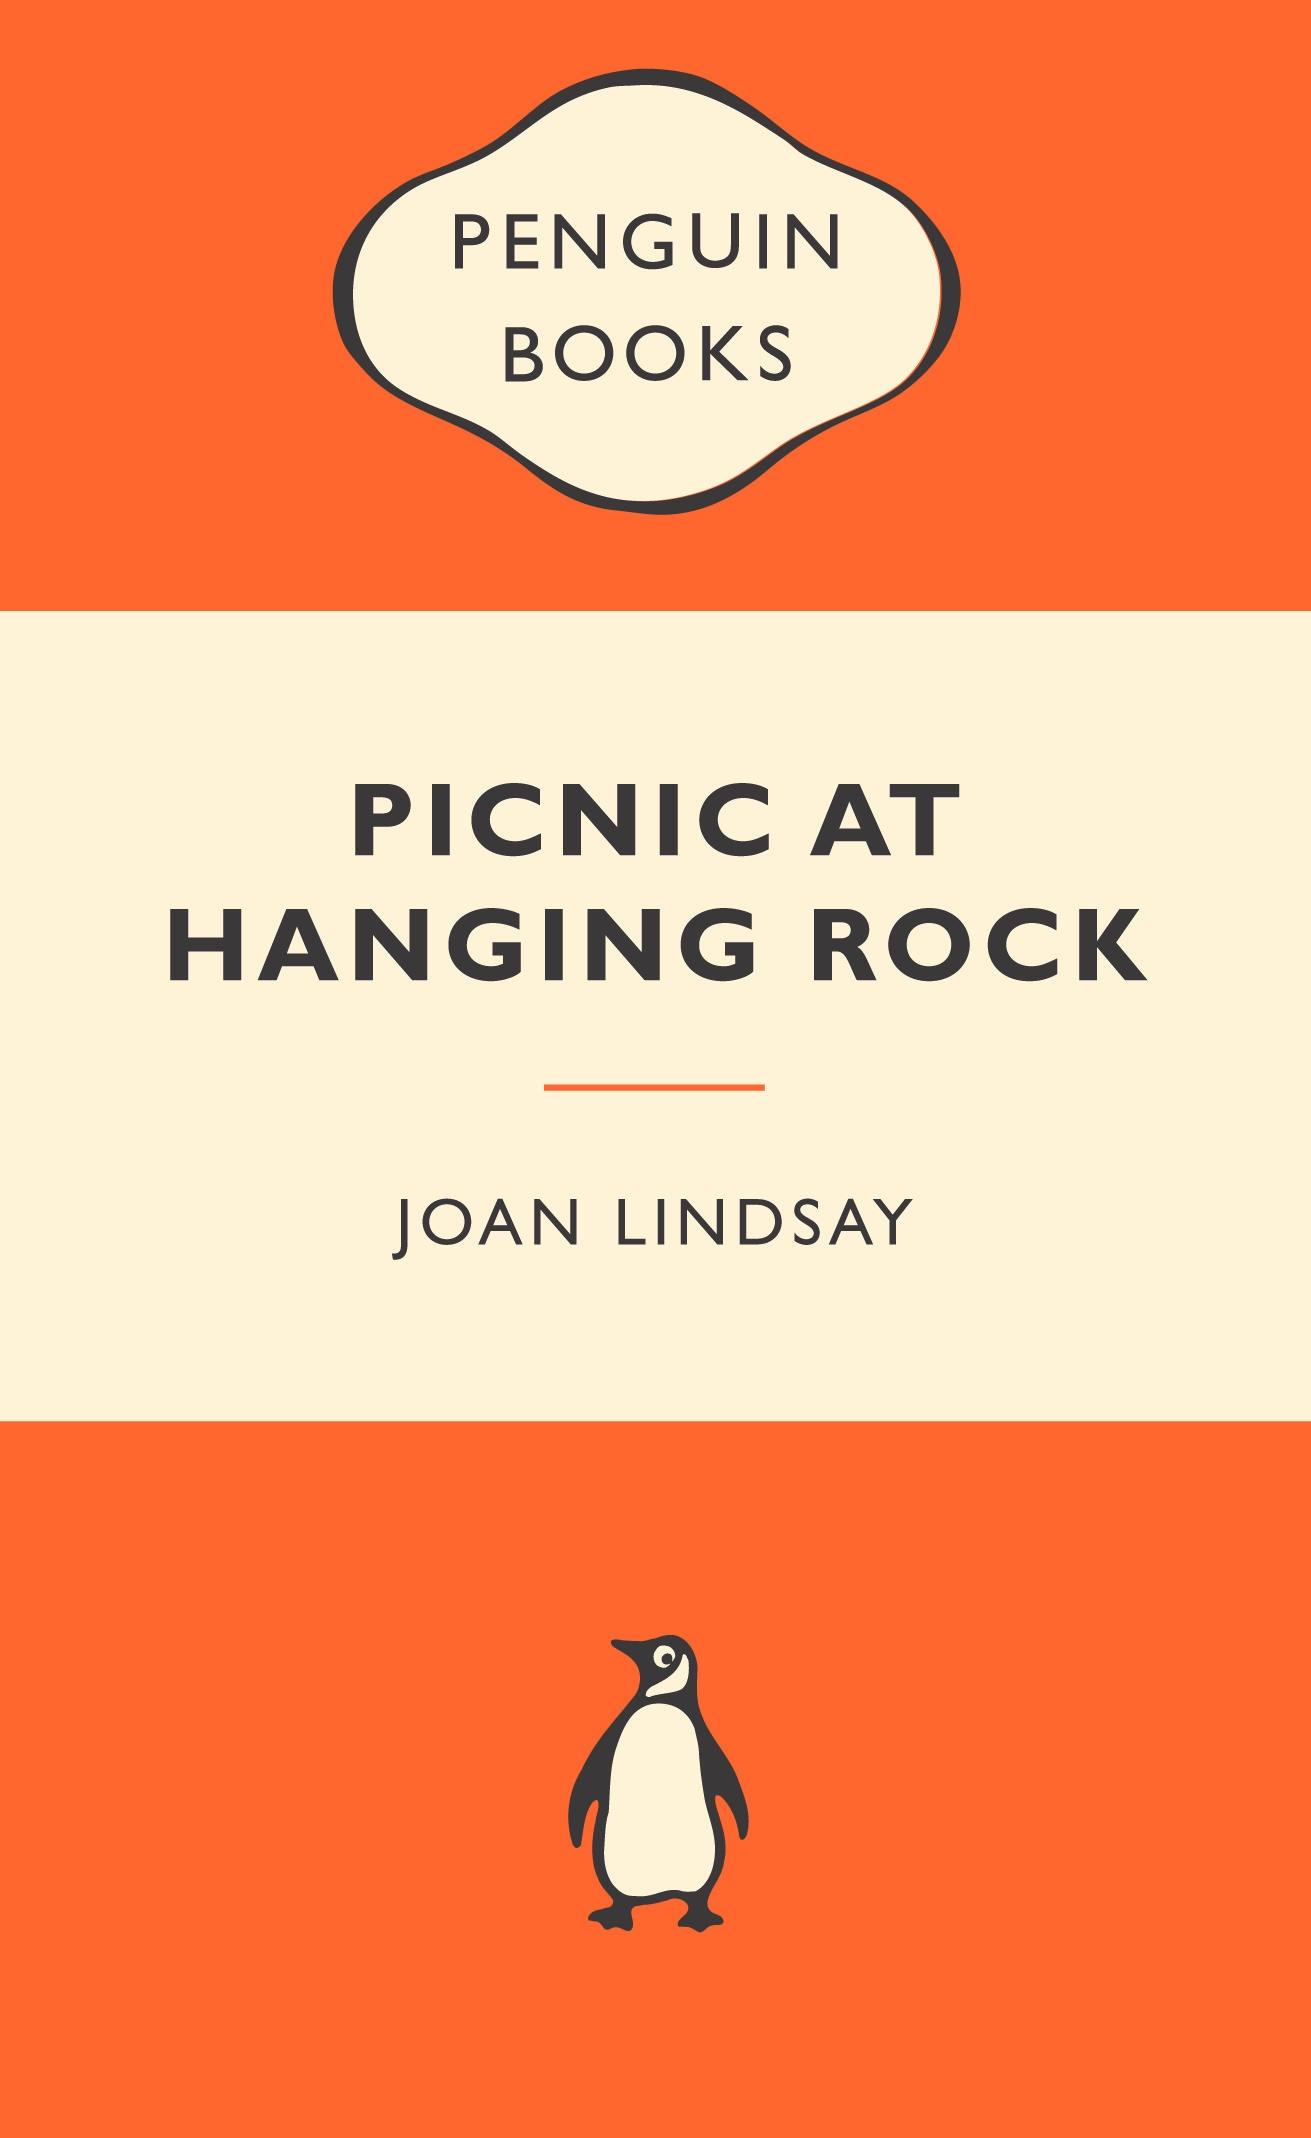 Penguin Book Cover Winners ~ Picnic at hanging rock popular penguins by joan lindsay